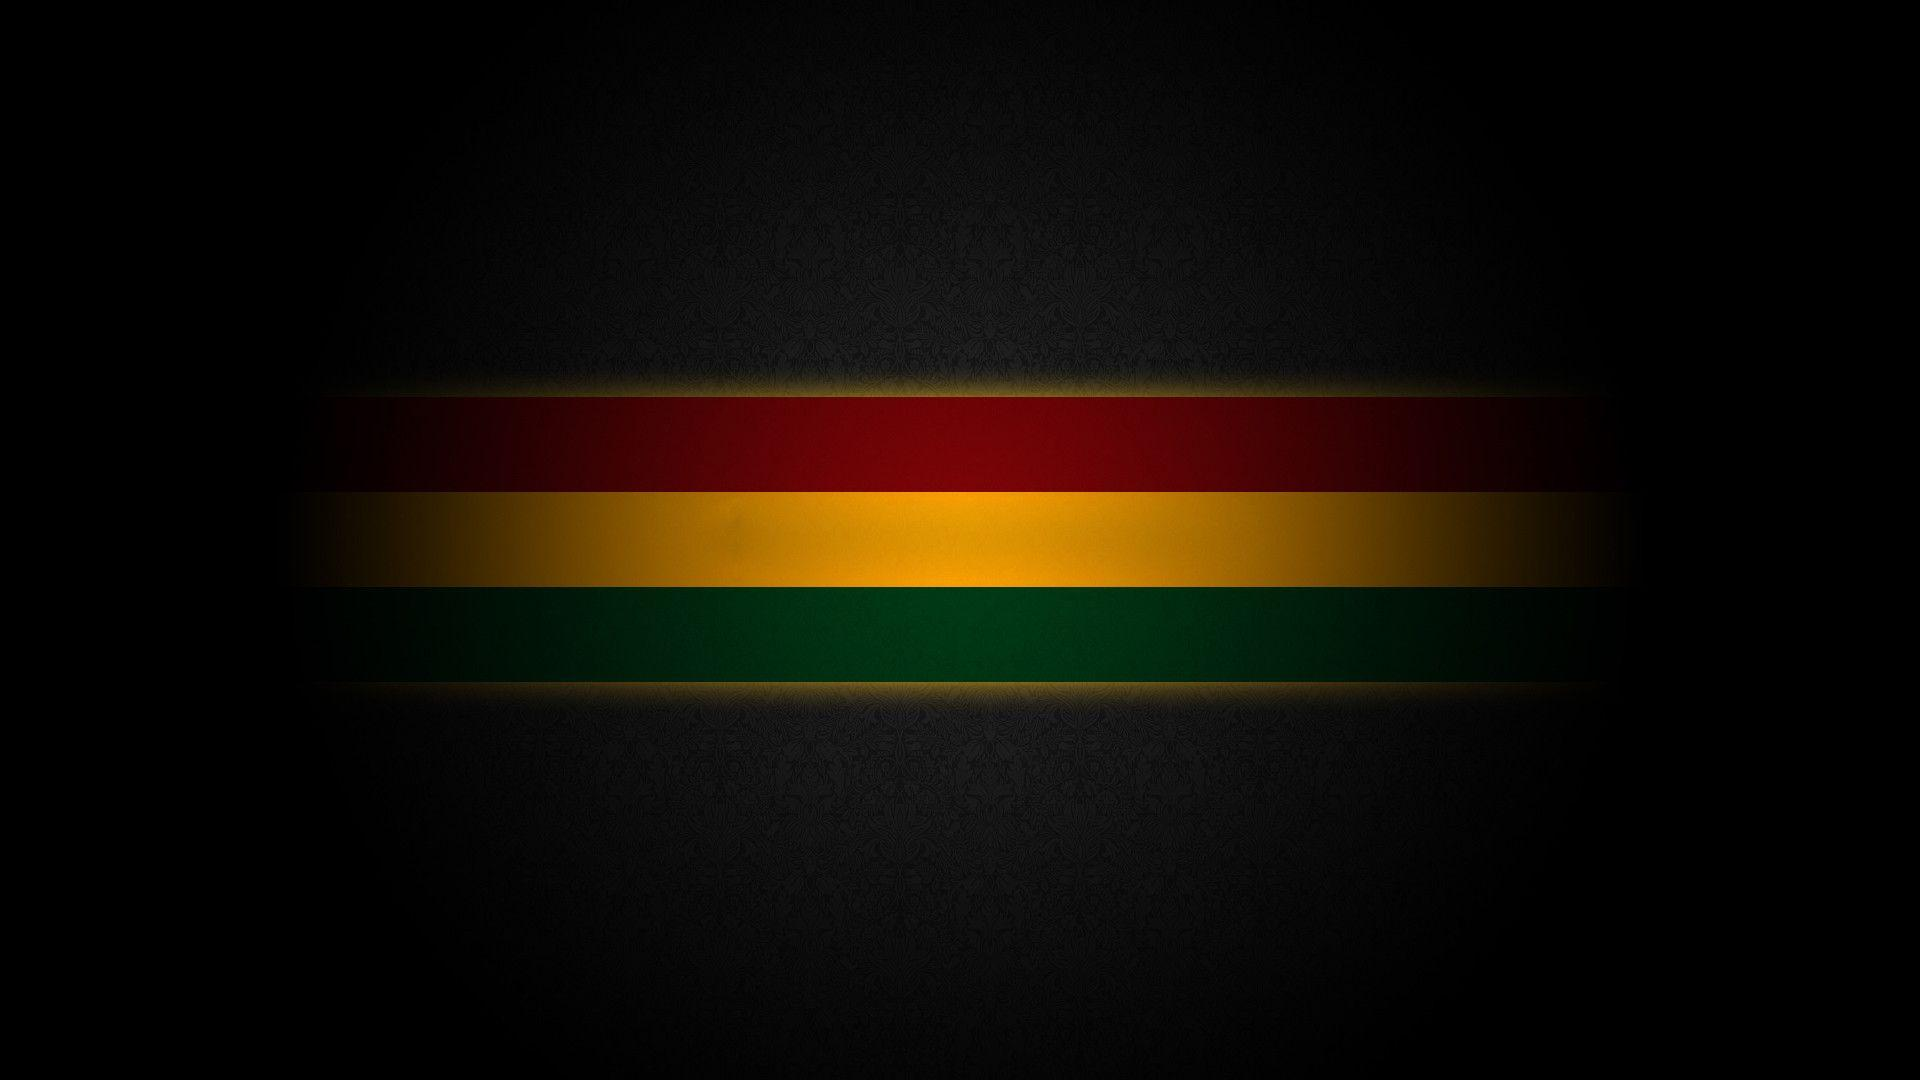 Jamaican Flag Colors >> HD Rasta Wallpapers 2015 - Wallpaper Cave